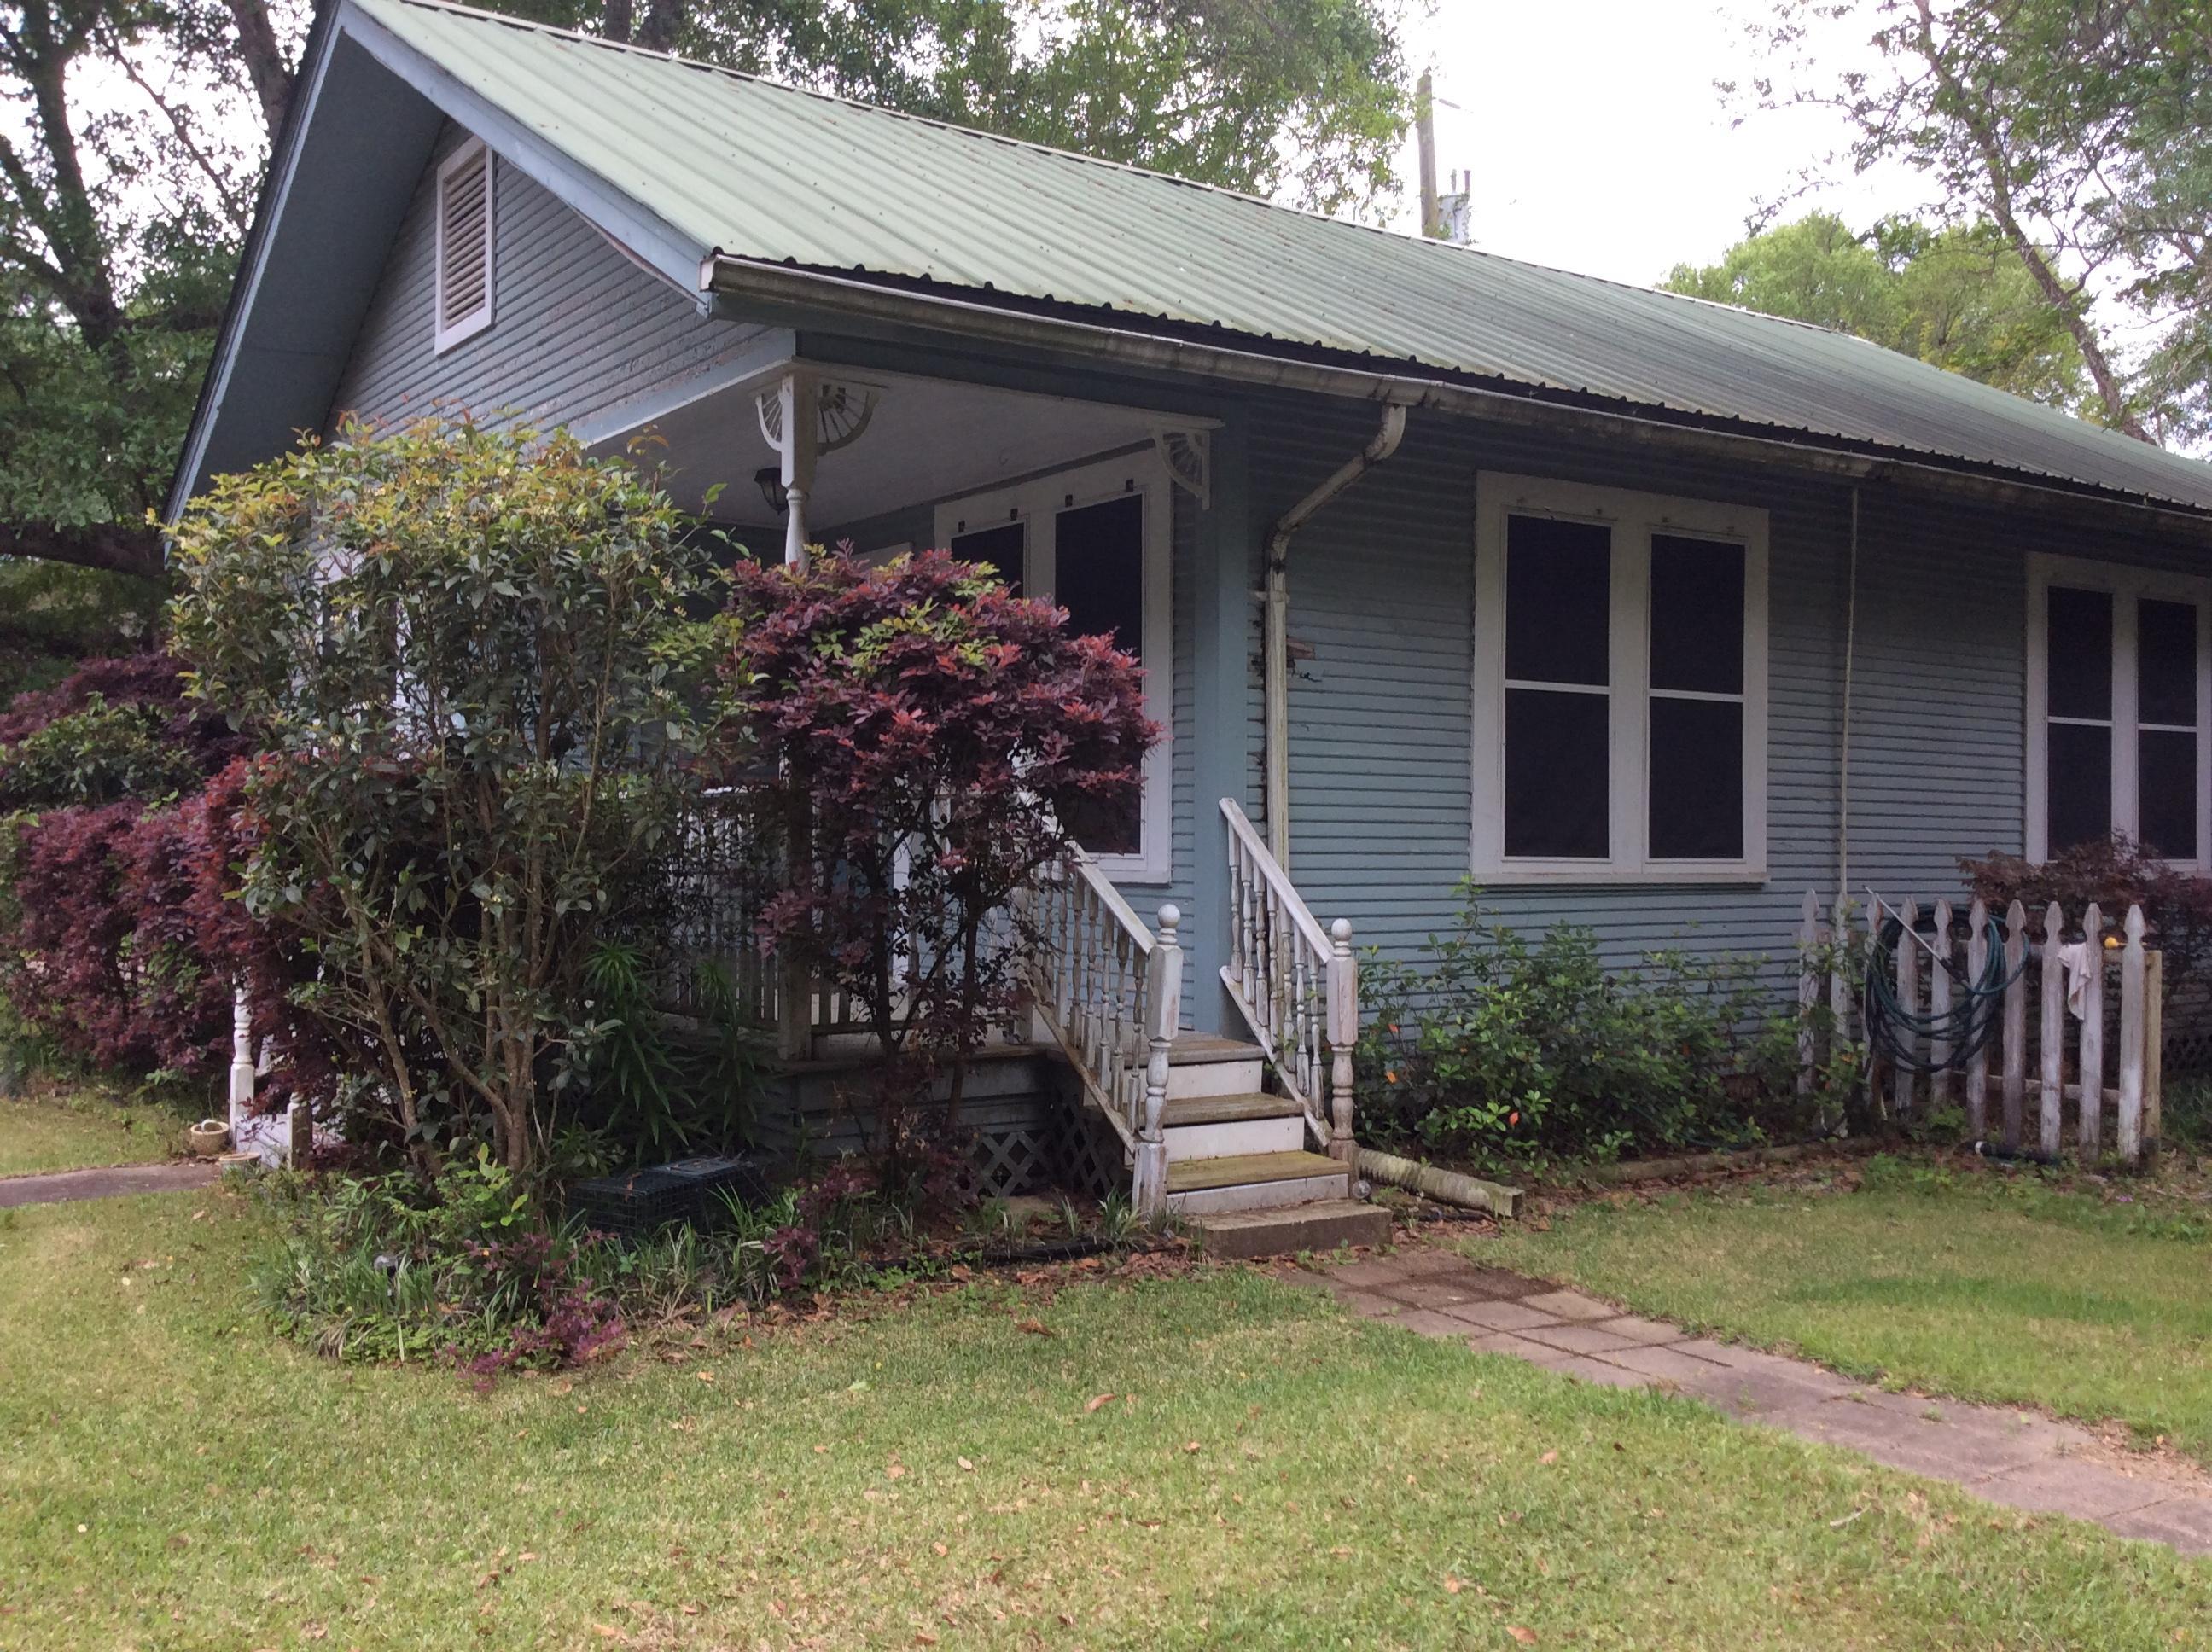 Merryville home for sale, 1032 Watson St, Merryville LA - $115,000